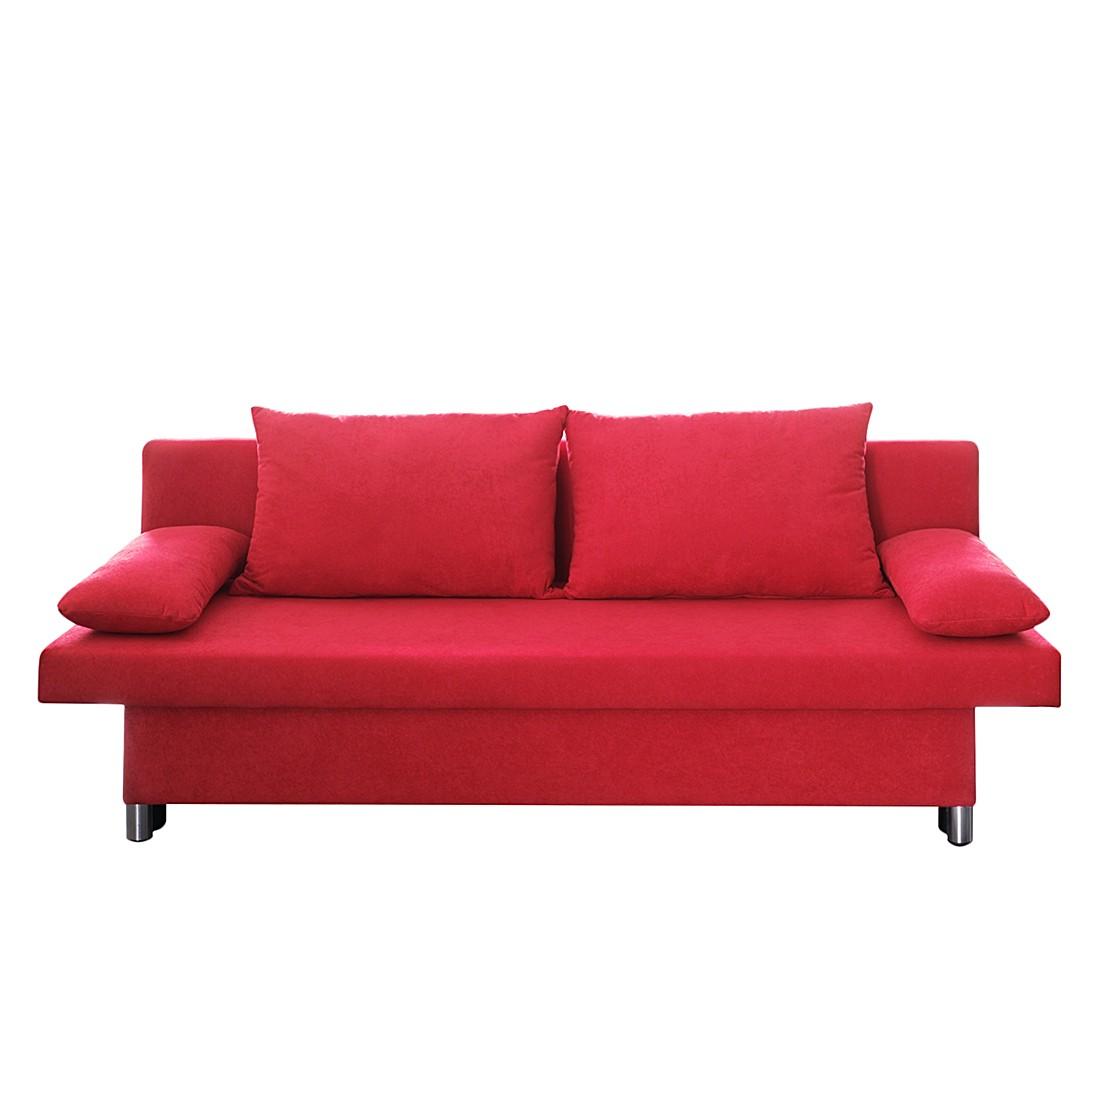 goedkoop Slaapbank Canto rode stof Home Design